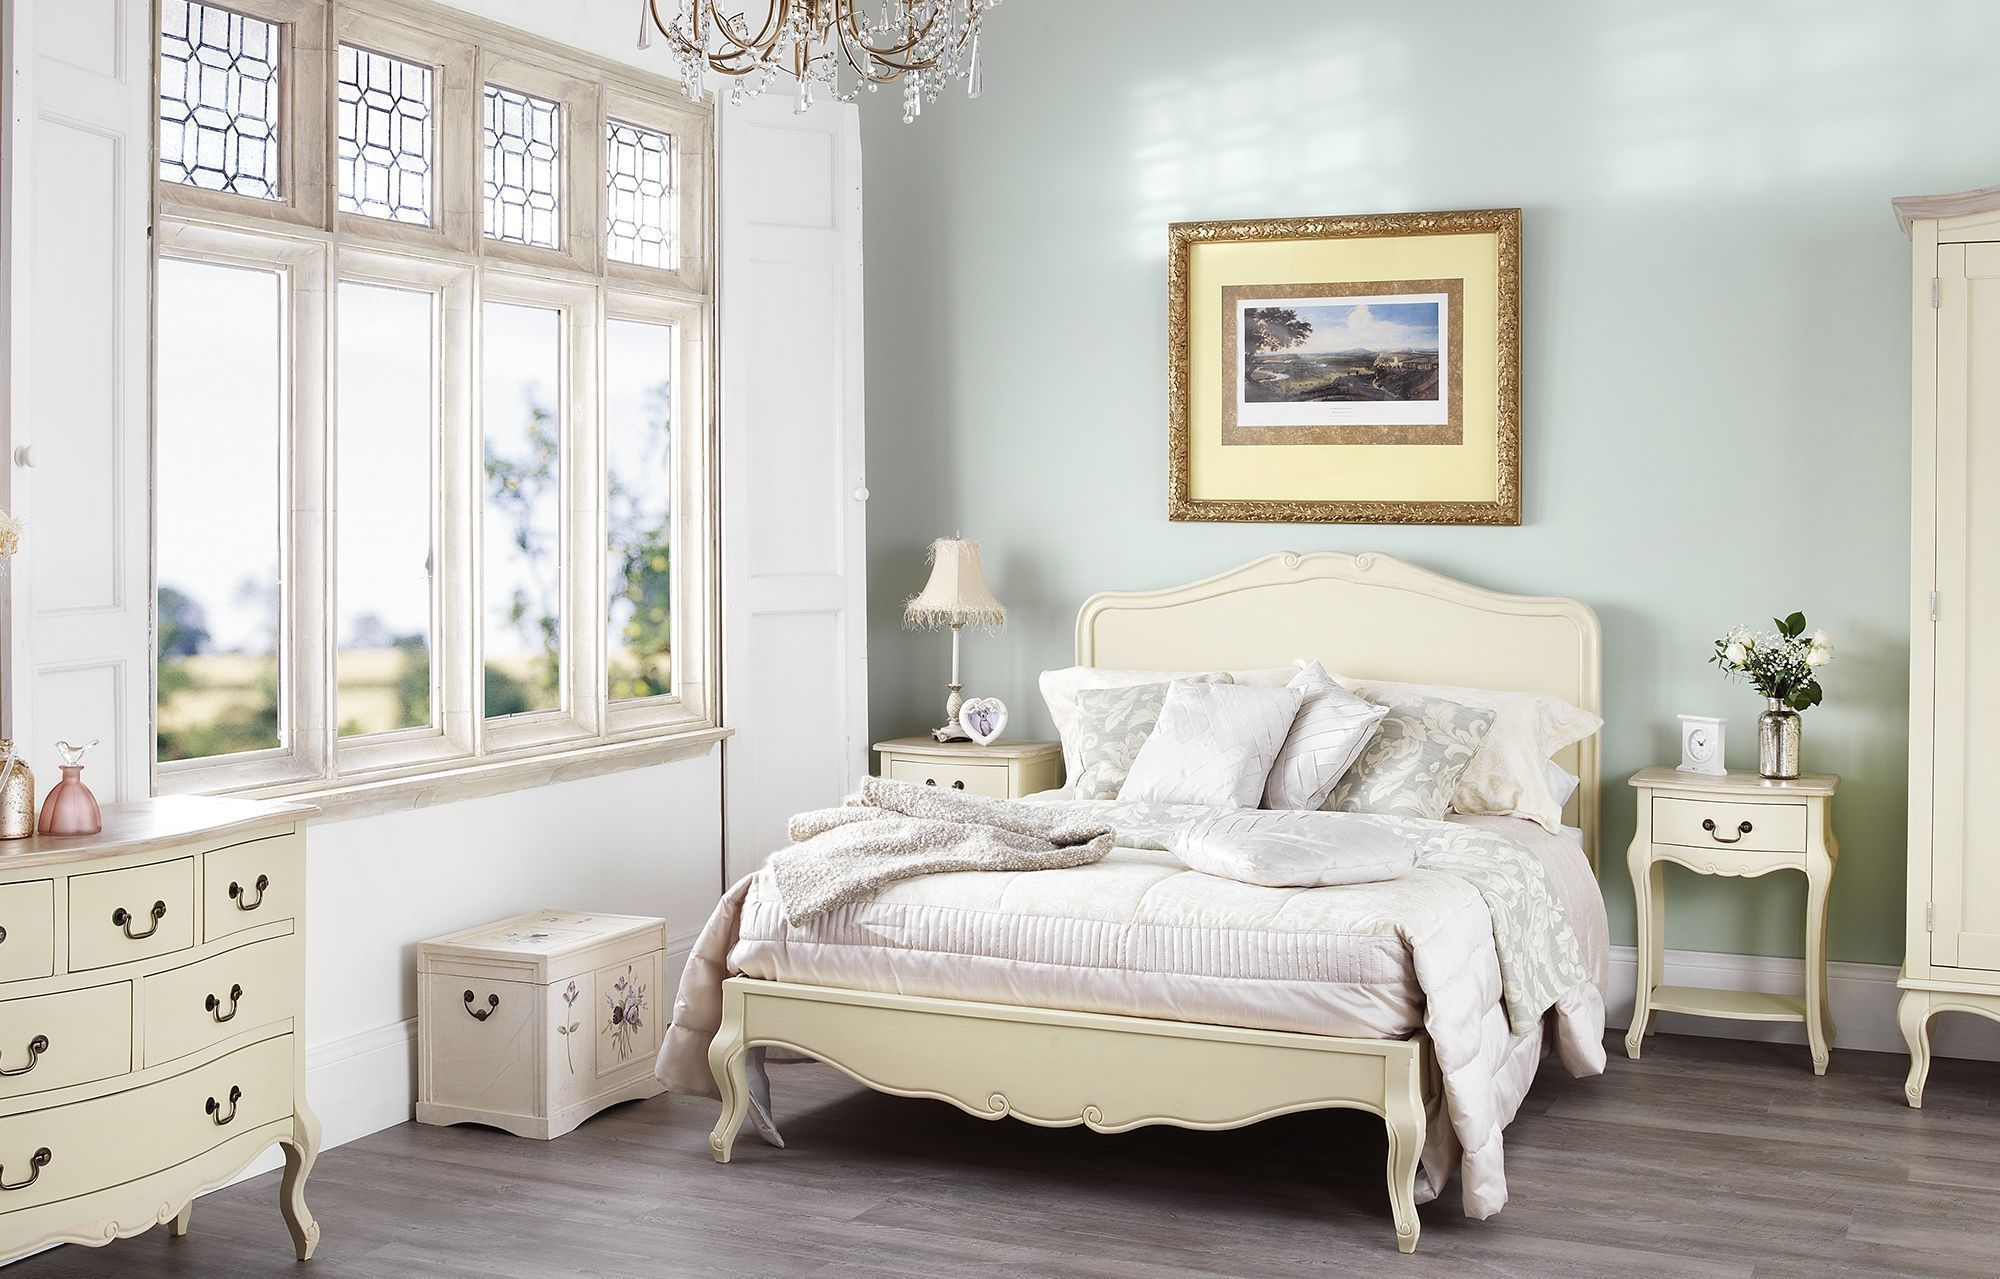 Shabby Chic Furniture Bedroom Shabby Chic Bedroom Furniture Cream Bedroom Furniture Shabby Chic Furniture